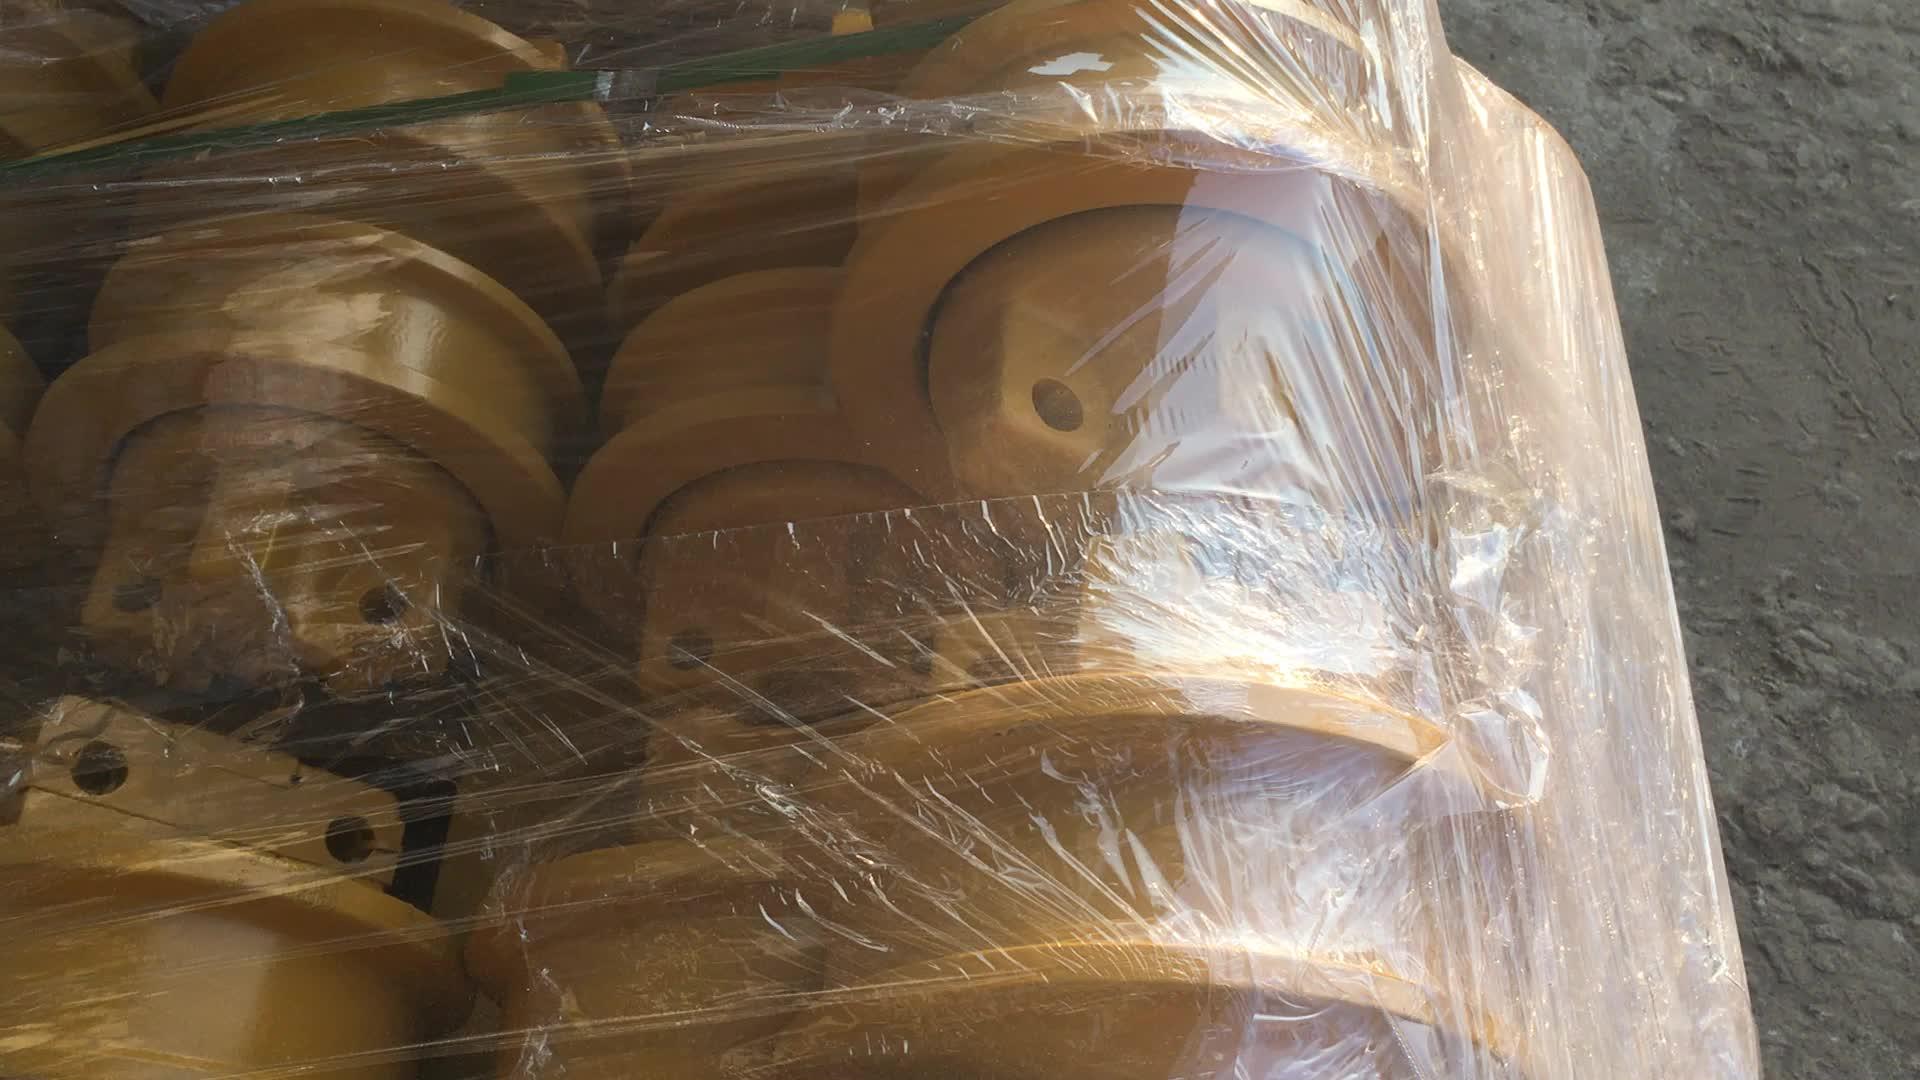 155-30-00250 145-30-00320 SF S/F singola flangia bulldozer pista roller per komatsu bulldozer D75-2 D80-18 D85-18 D95-1 D85-21